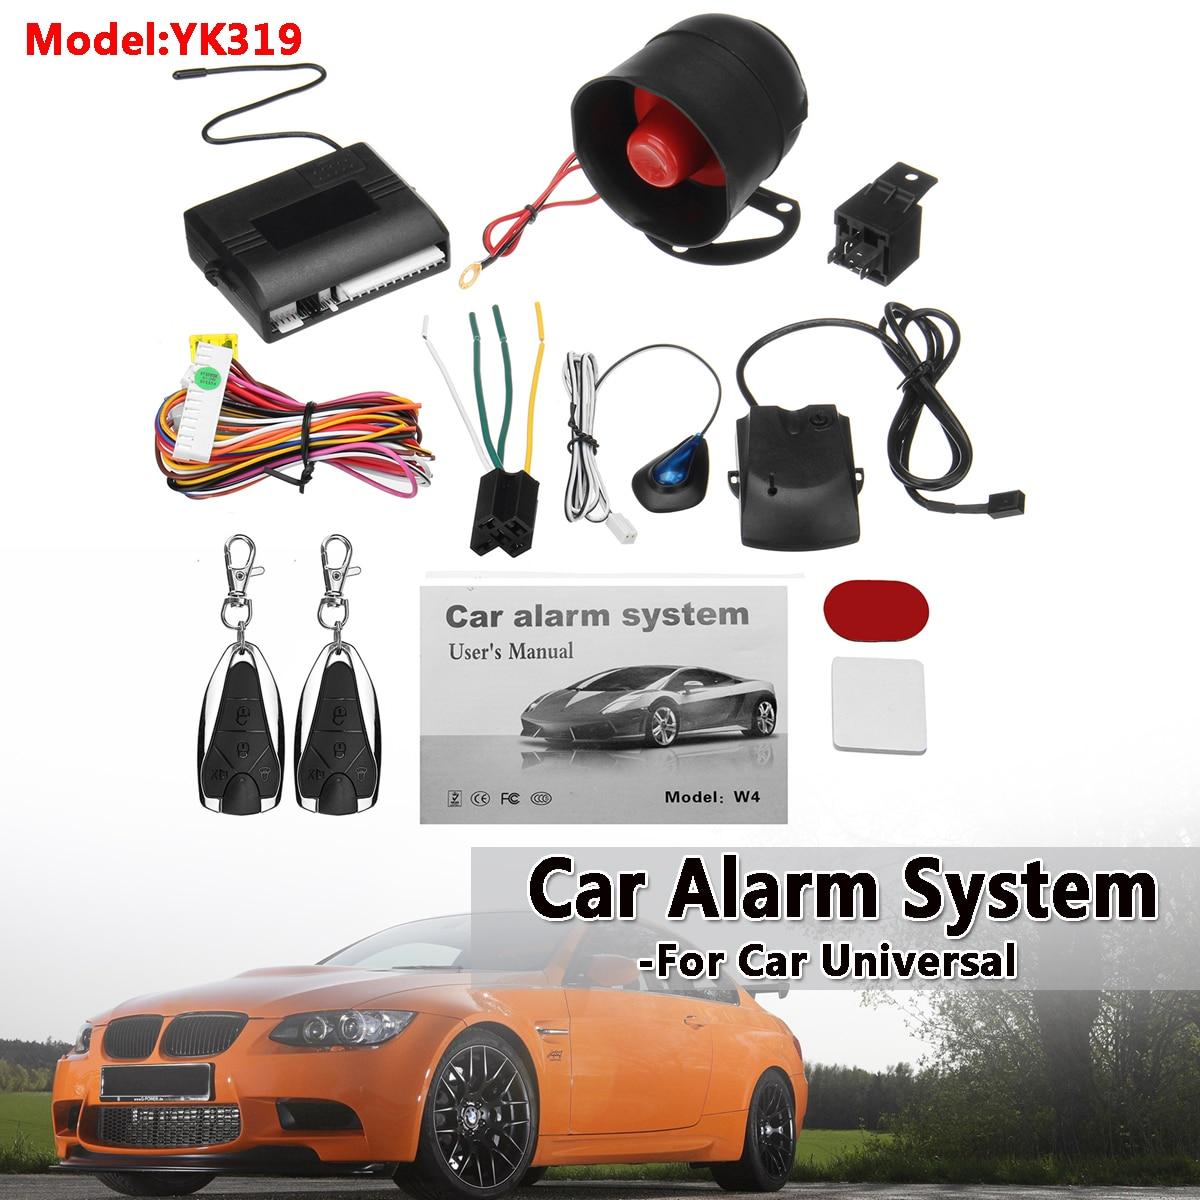 Universal 1-Way Car Alarm Security System Keyless Entry Siren +2 Remote Controller Vehicle Protection Anti-theft Burglar Alarm